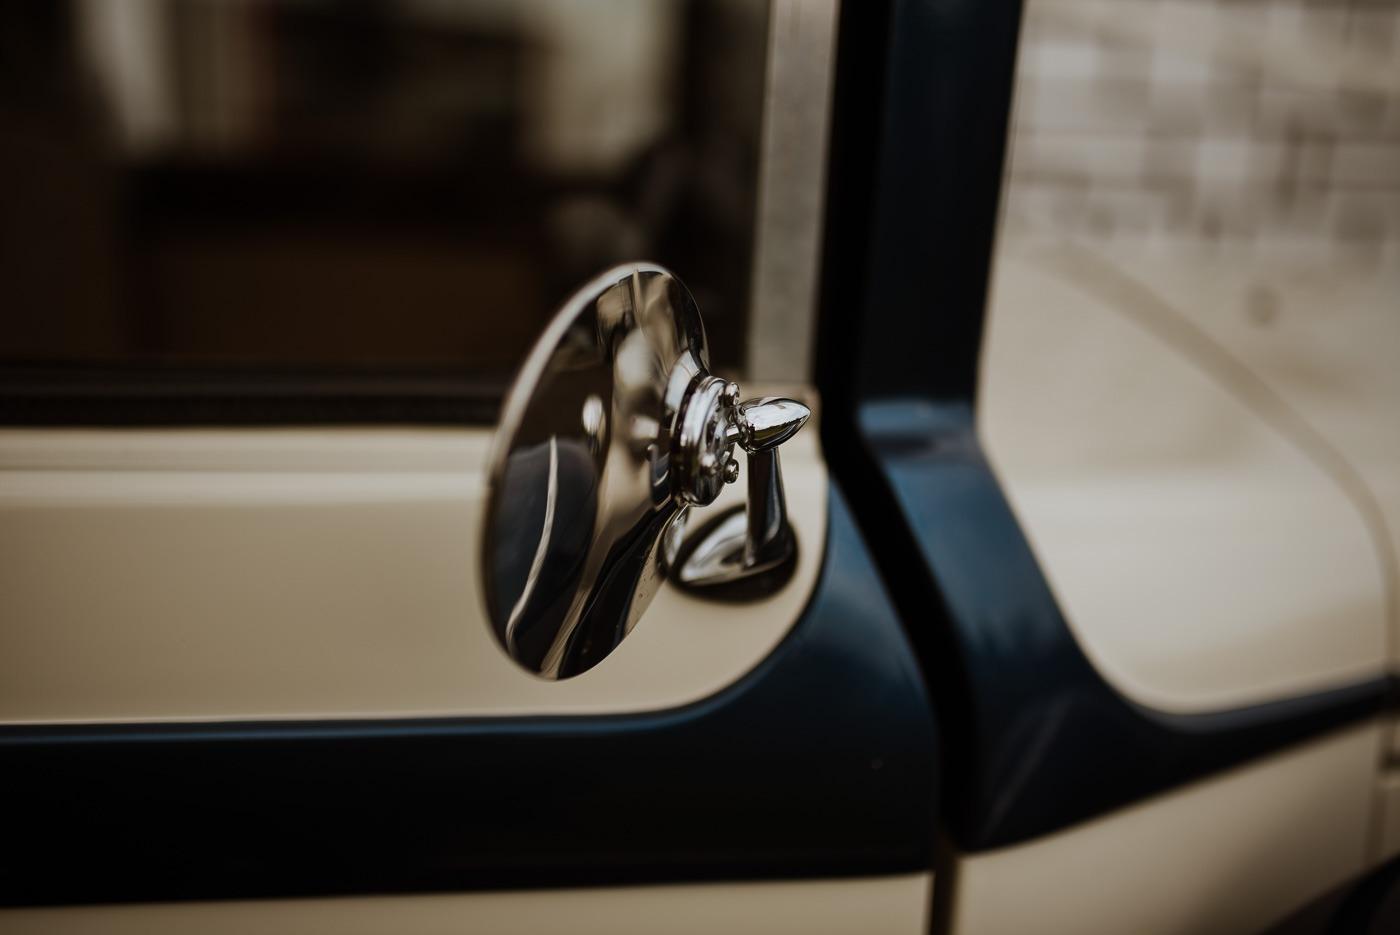 A close up of a car window